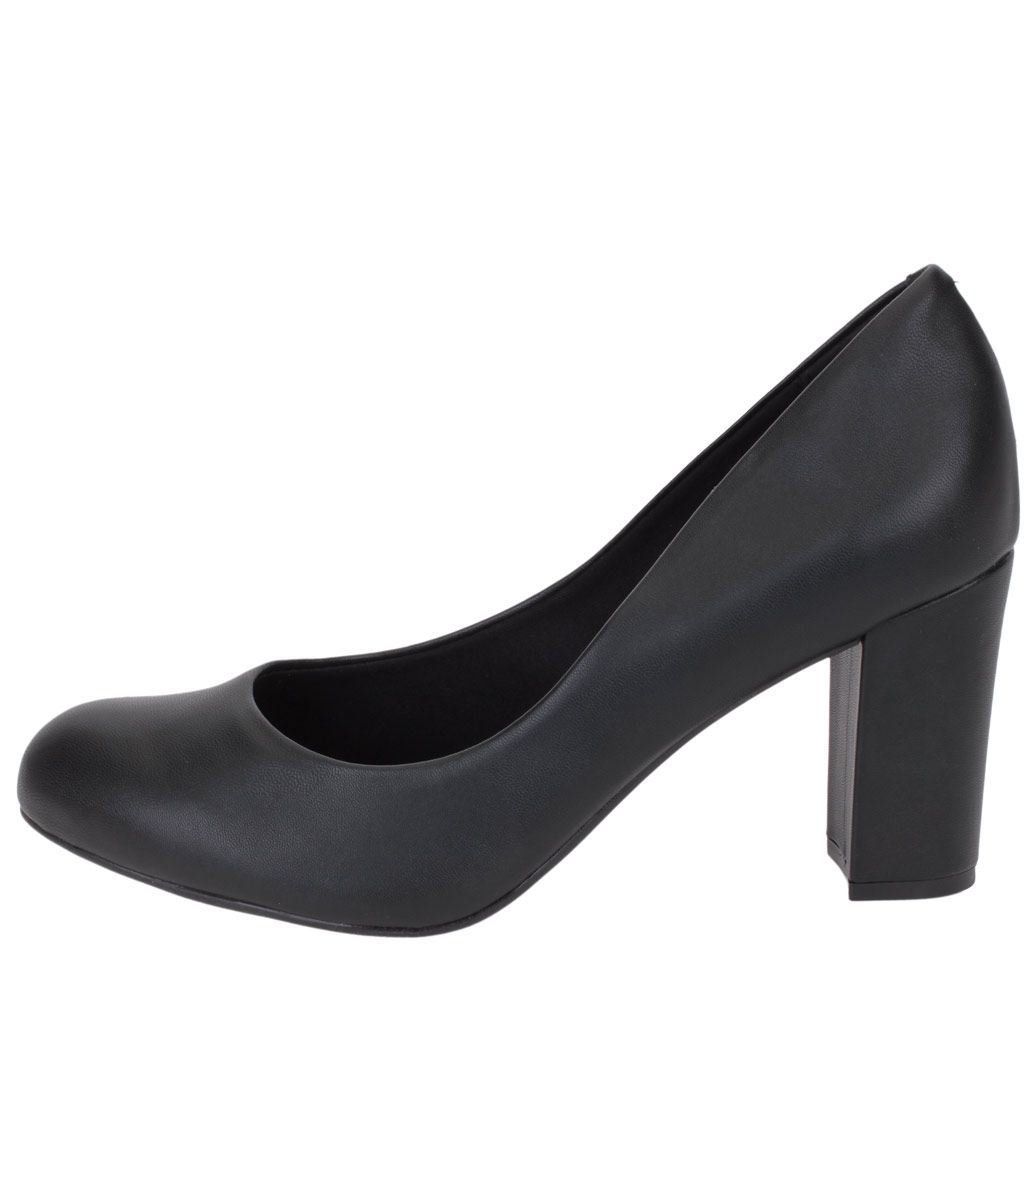 4a1904a1f Scarpin Feminino Vizzano Salto Grosso - Lojas Renner Sapatos Femeninos